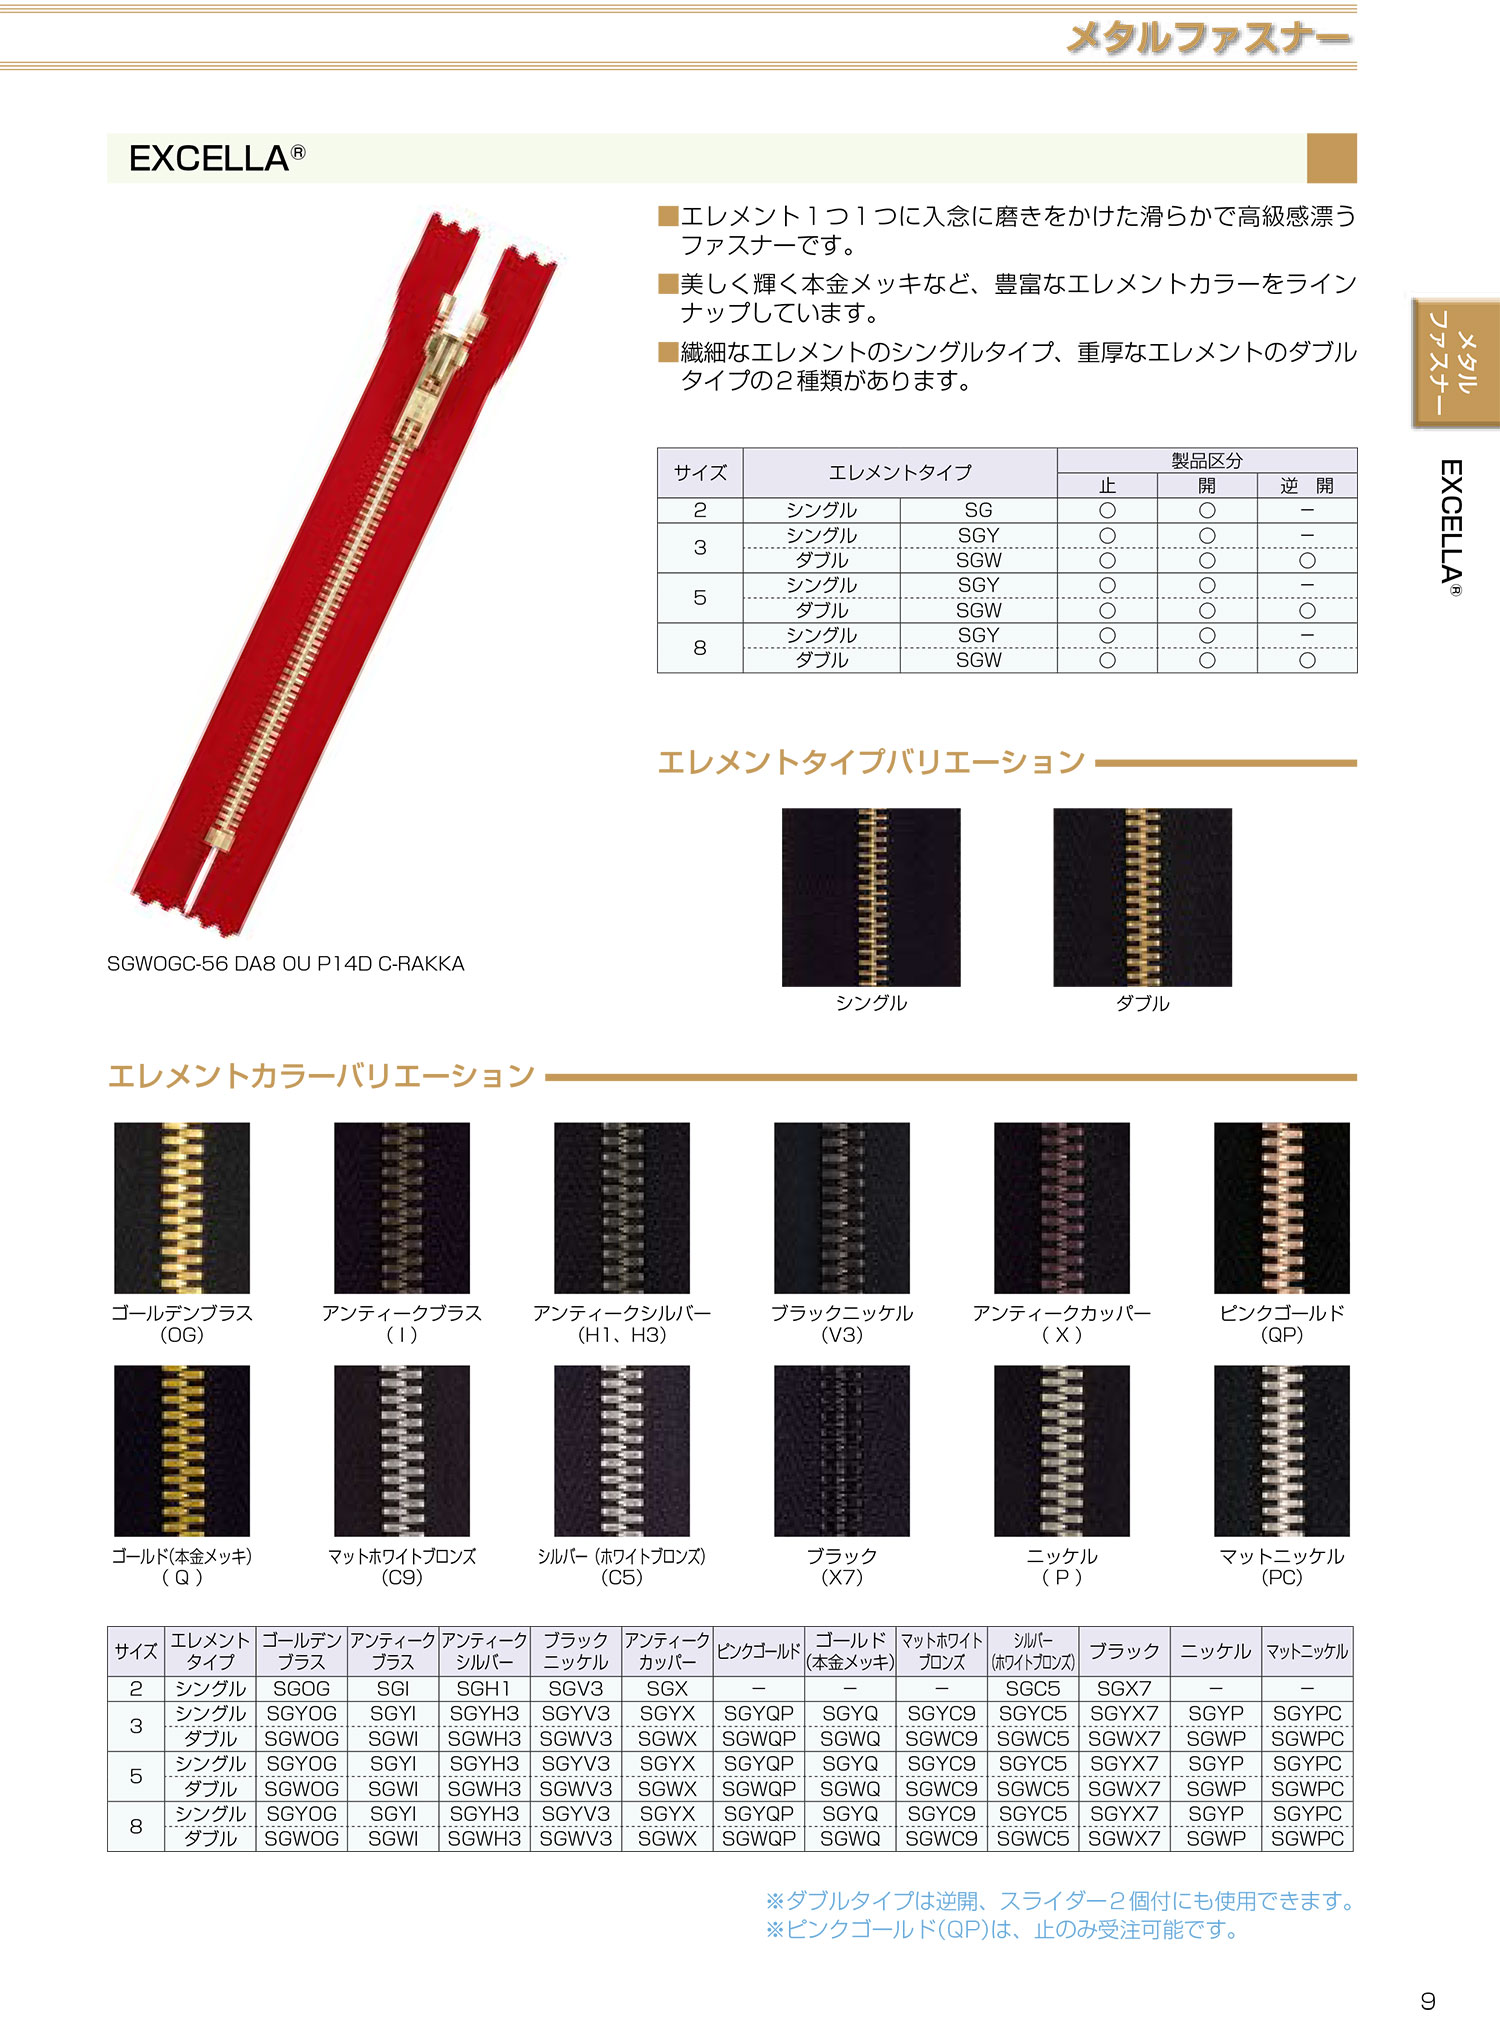 8SGWH3MR エクセラ 8サイズ アンティークシルバー 逆開 ダブル[ファスナー] YKK/オークラ商事 - ApparelX アパレル資材卸通販